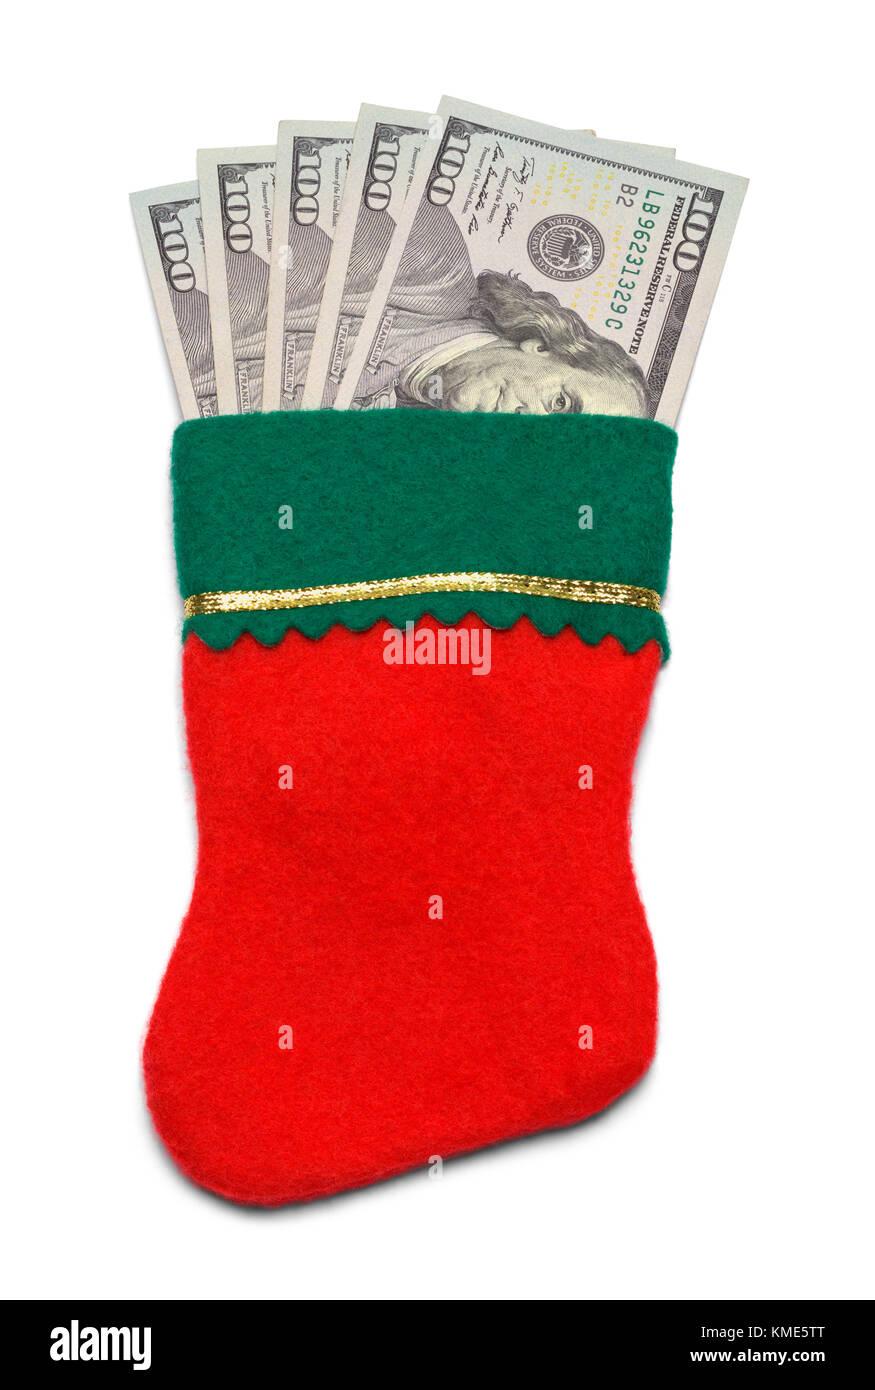 Christmas Stocking with Cash Money Isolated on a White Background. - Stock Image